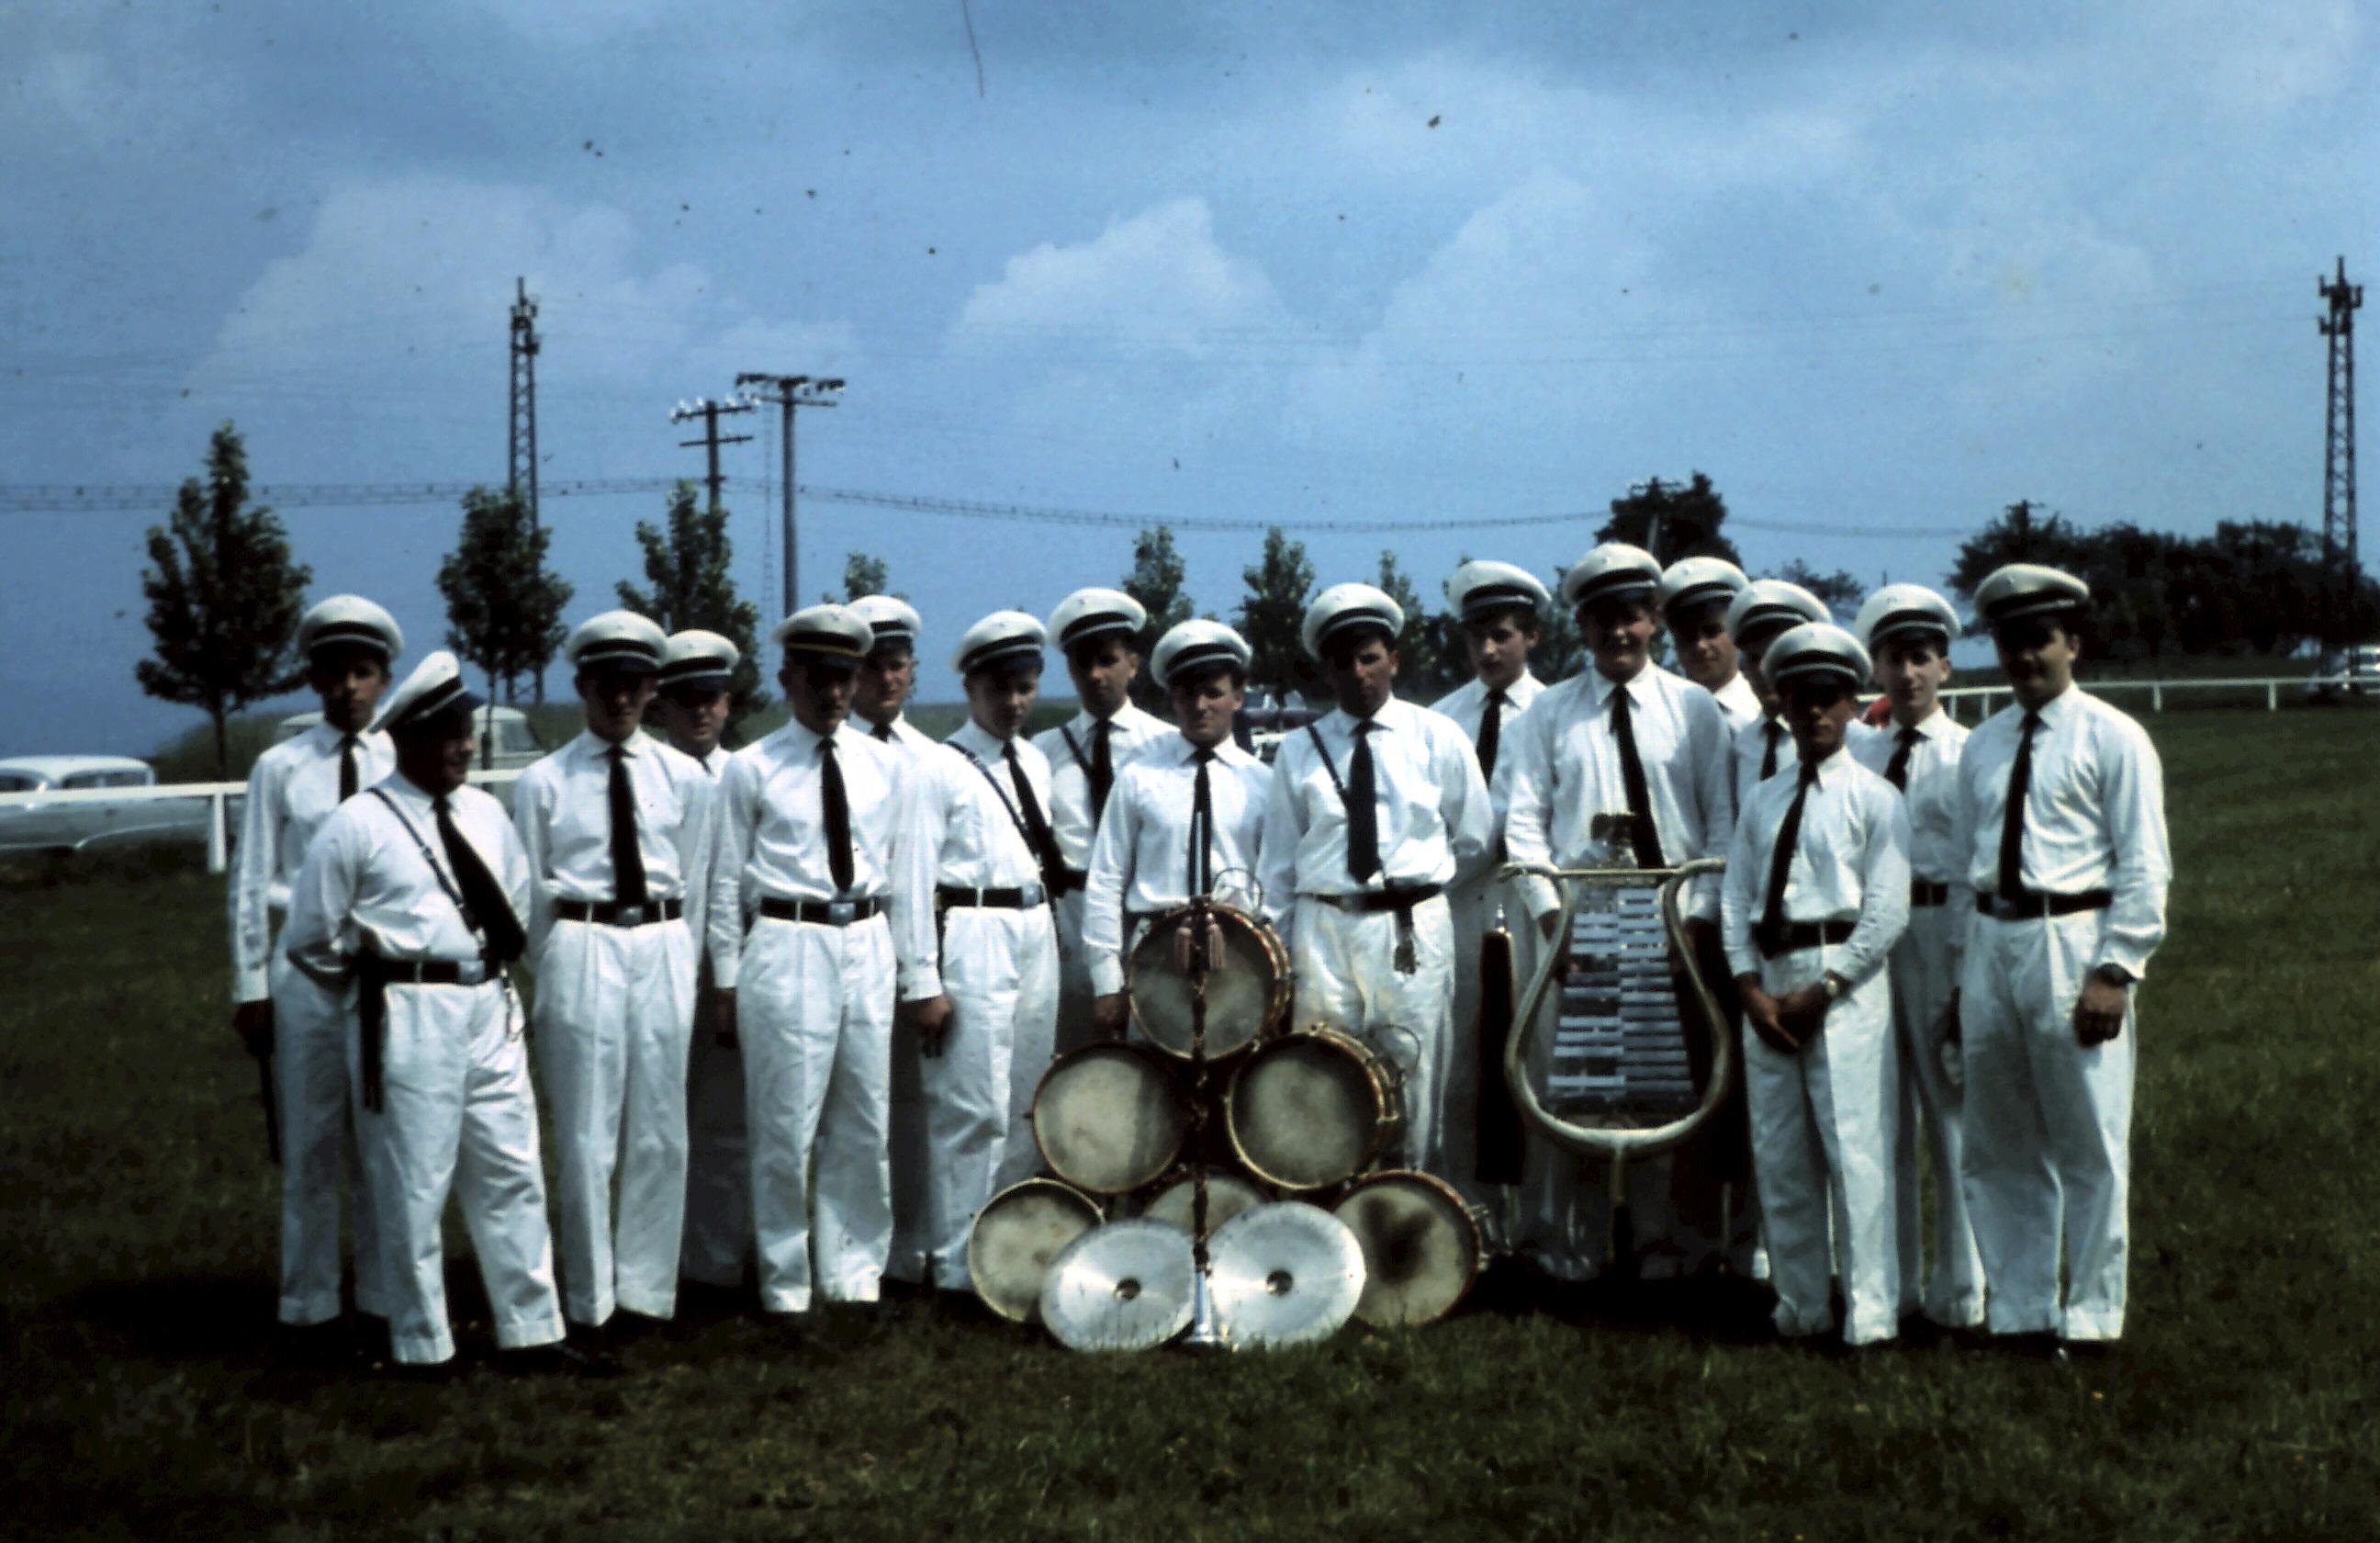 1-saengerfest-1959-0023.jpg